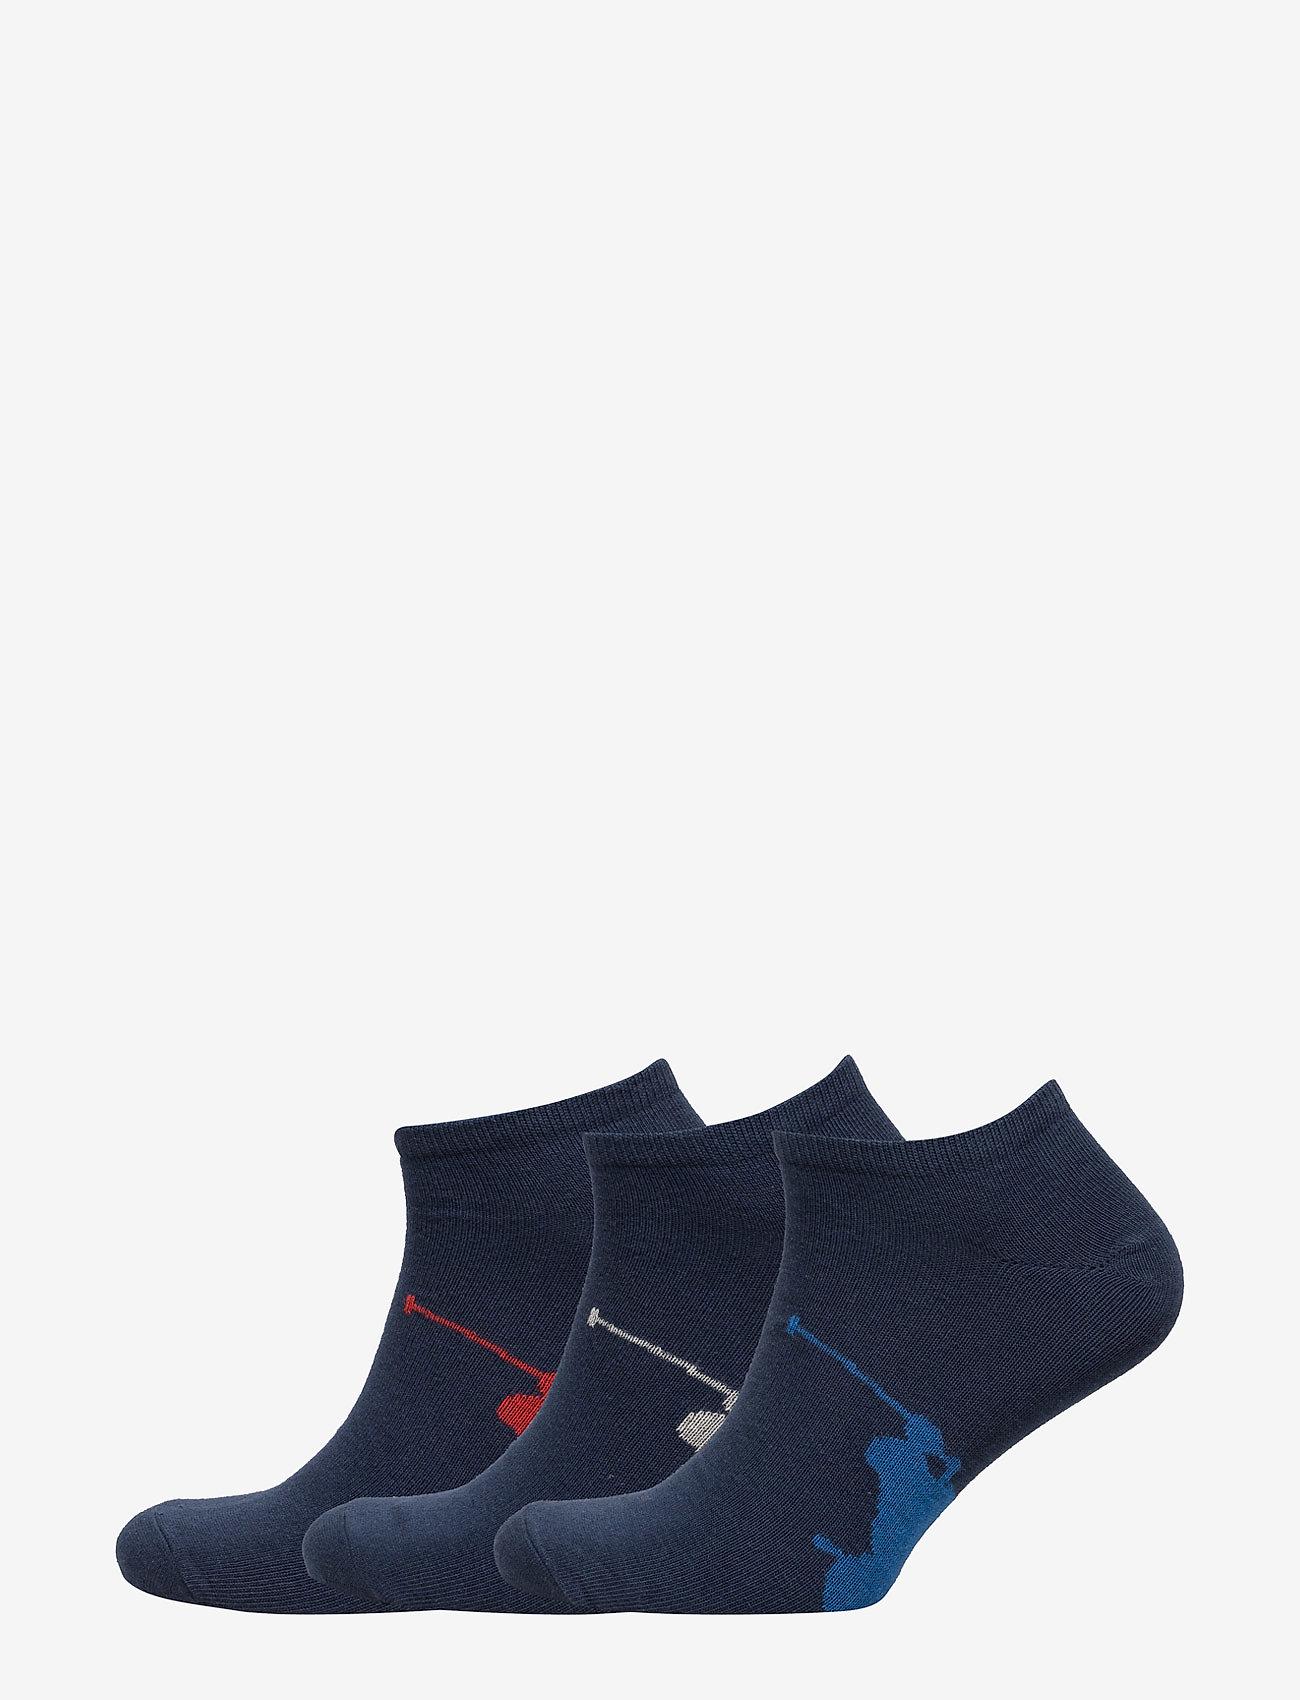 Polo Ralph Lauren Underwear - BPP SOLE-PED-3 PACK - ankle socks - navy multi - 0